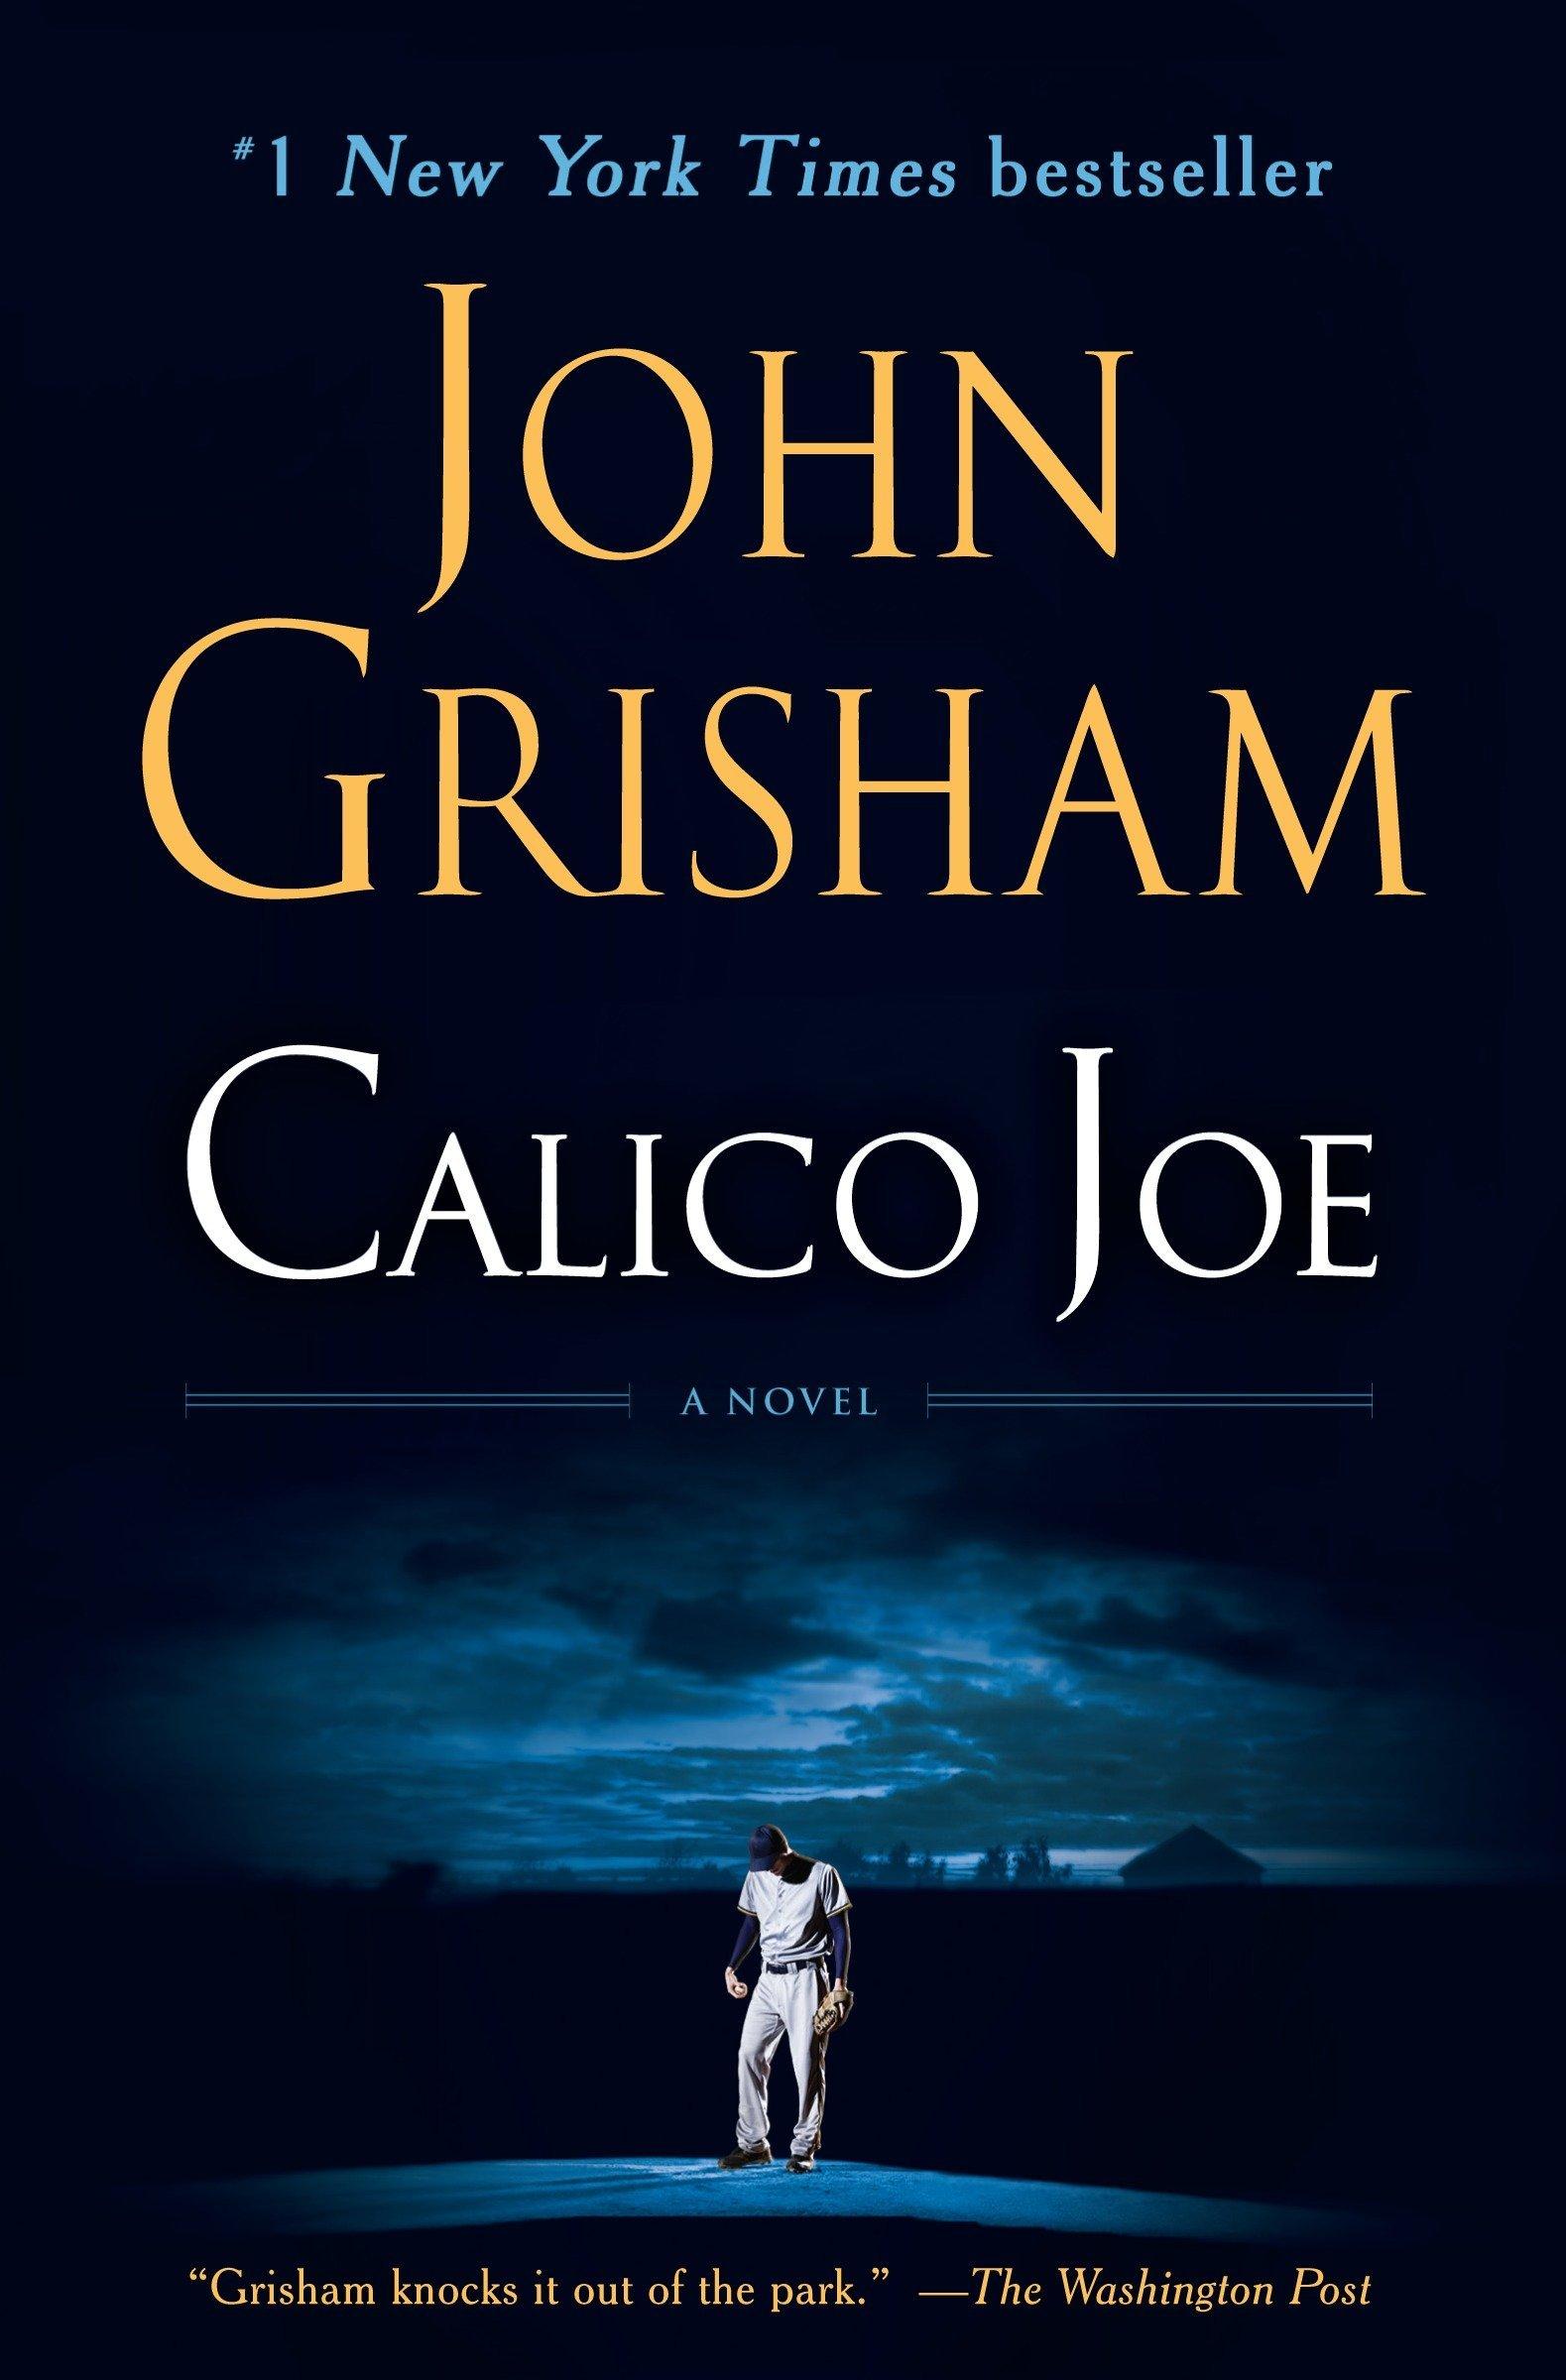 Calico Joe- A Novel ebook by John Grisham